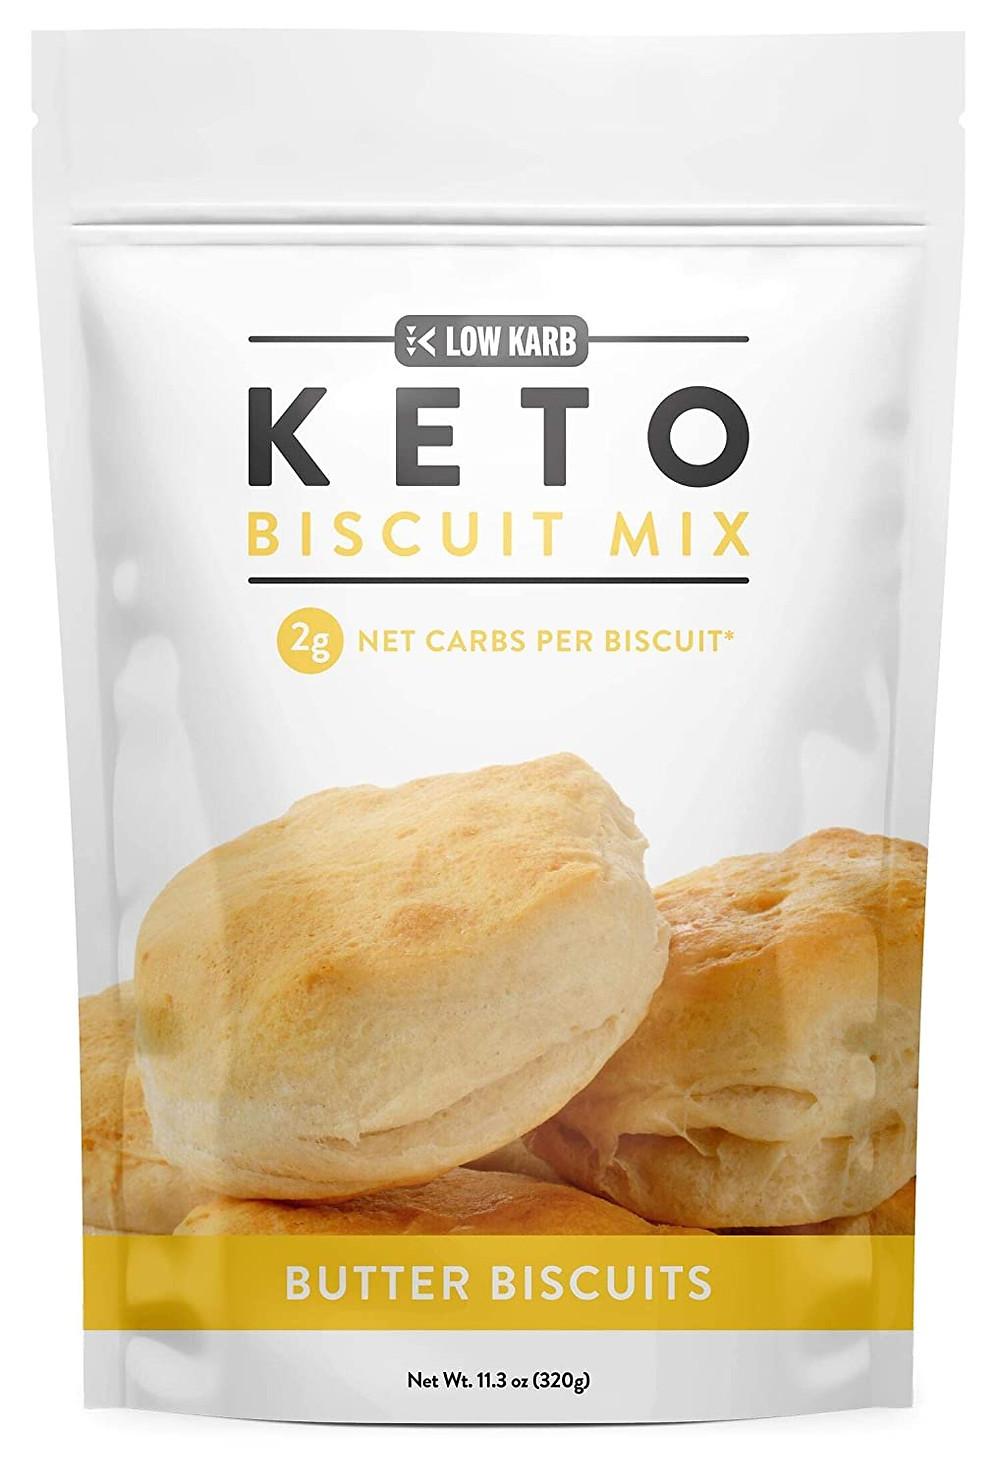 Keto Friendly breads Keto biscuits ketogenic breakfast ideas